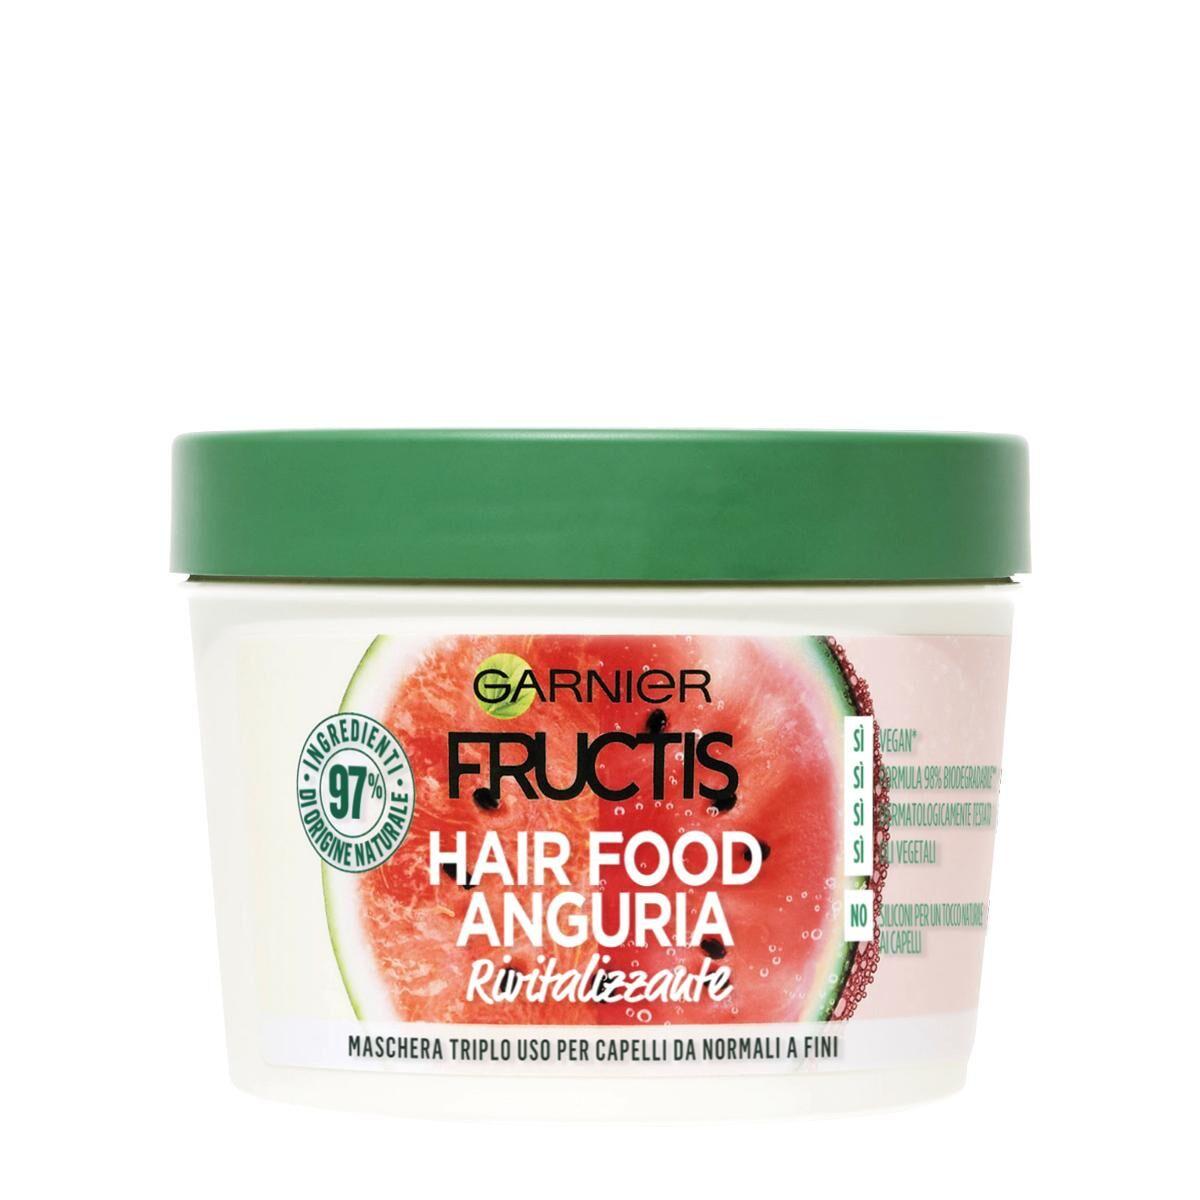 GARNIER Fructis Hair Food Anguria 390ml